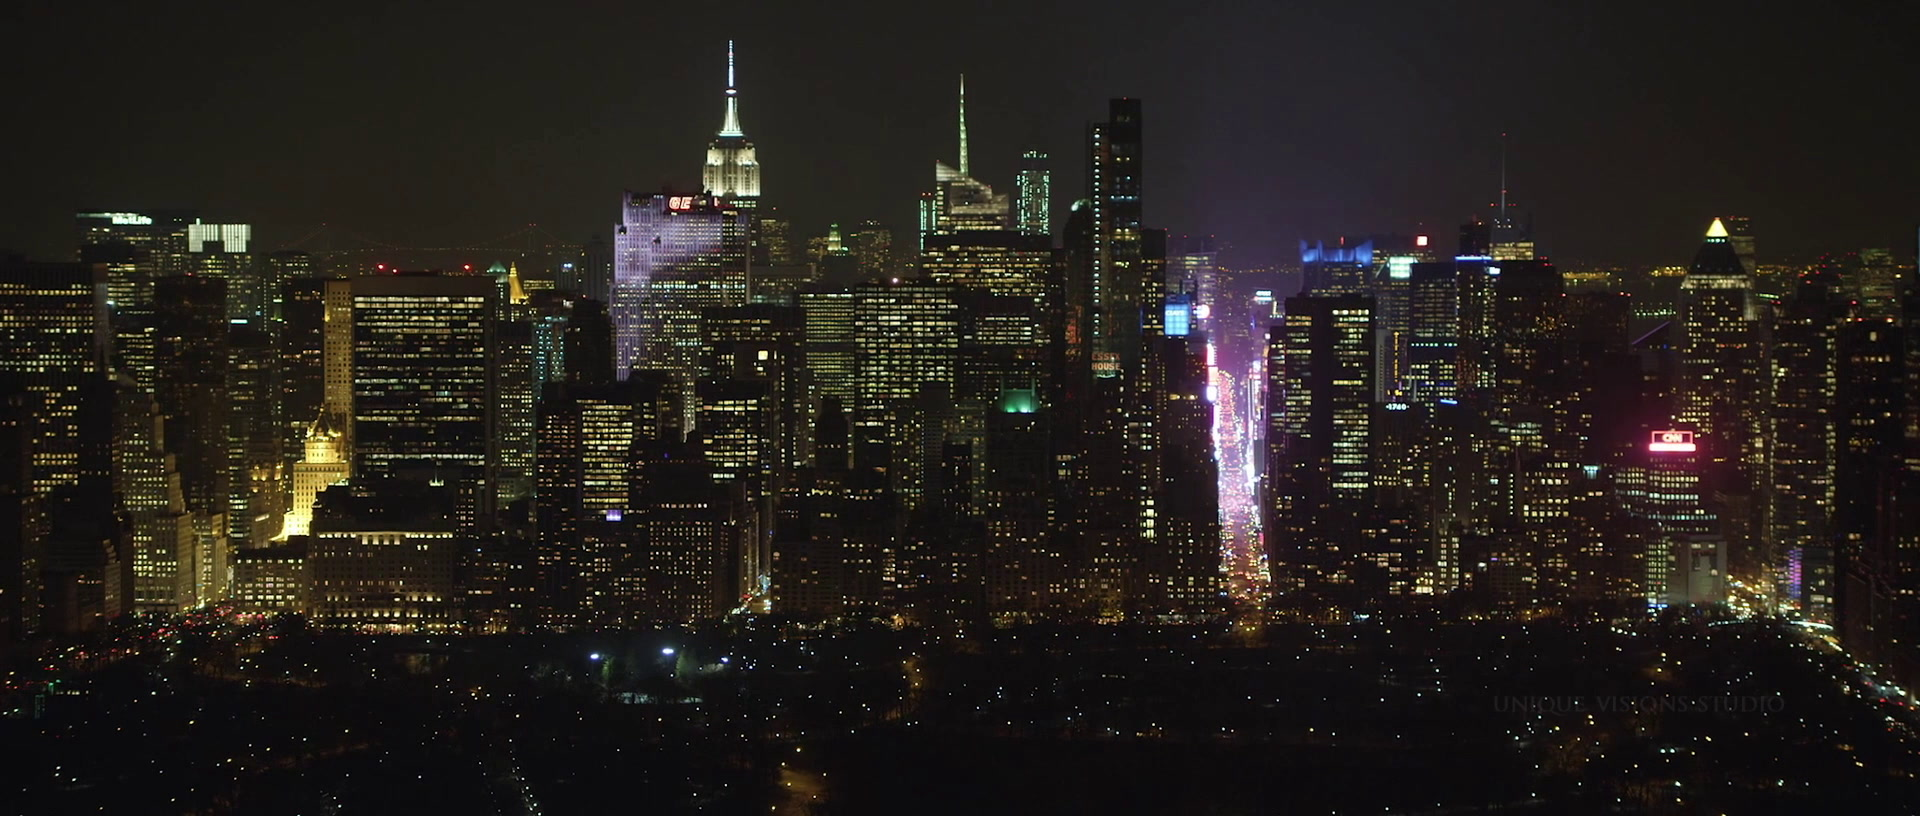 Priyanka + Vikas | New York, New York | Cipriani Wall Street